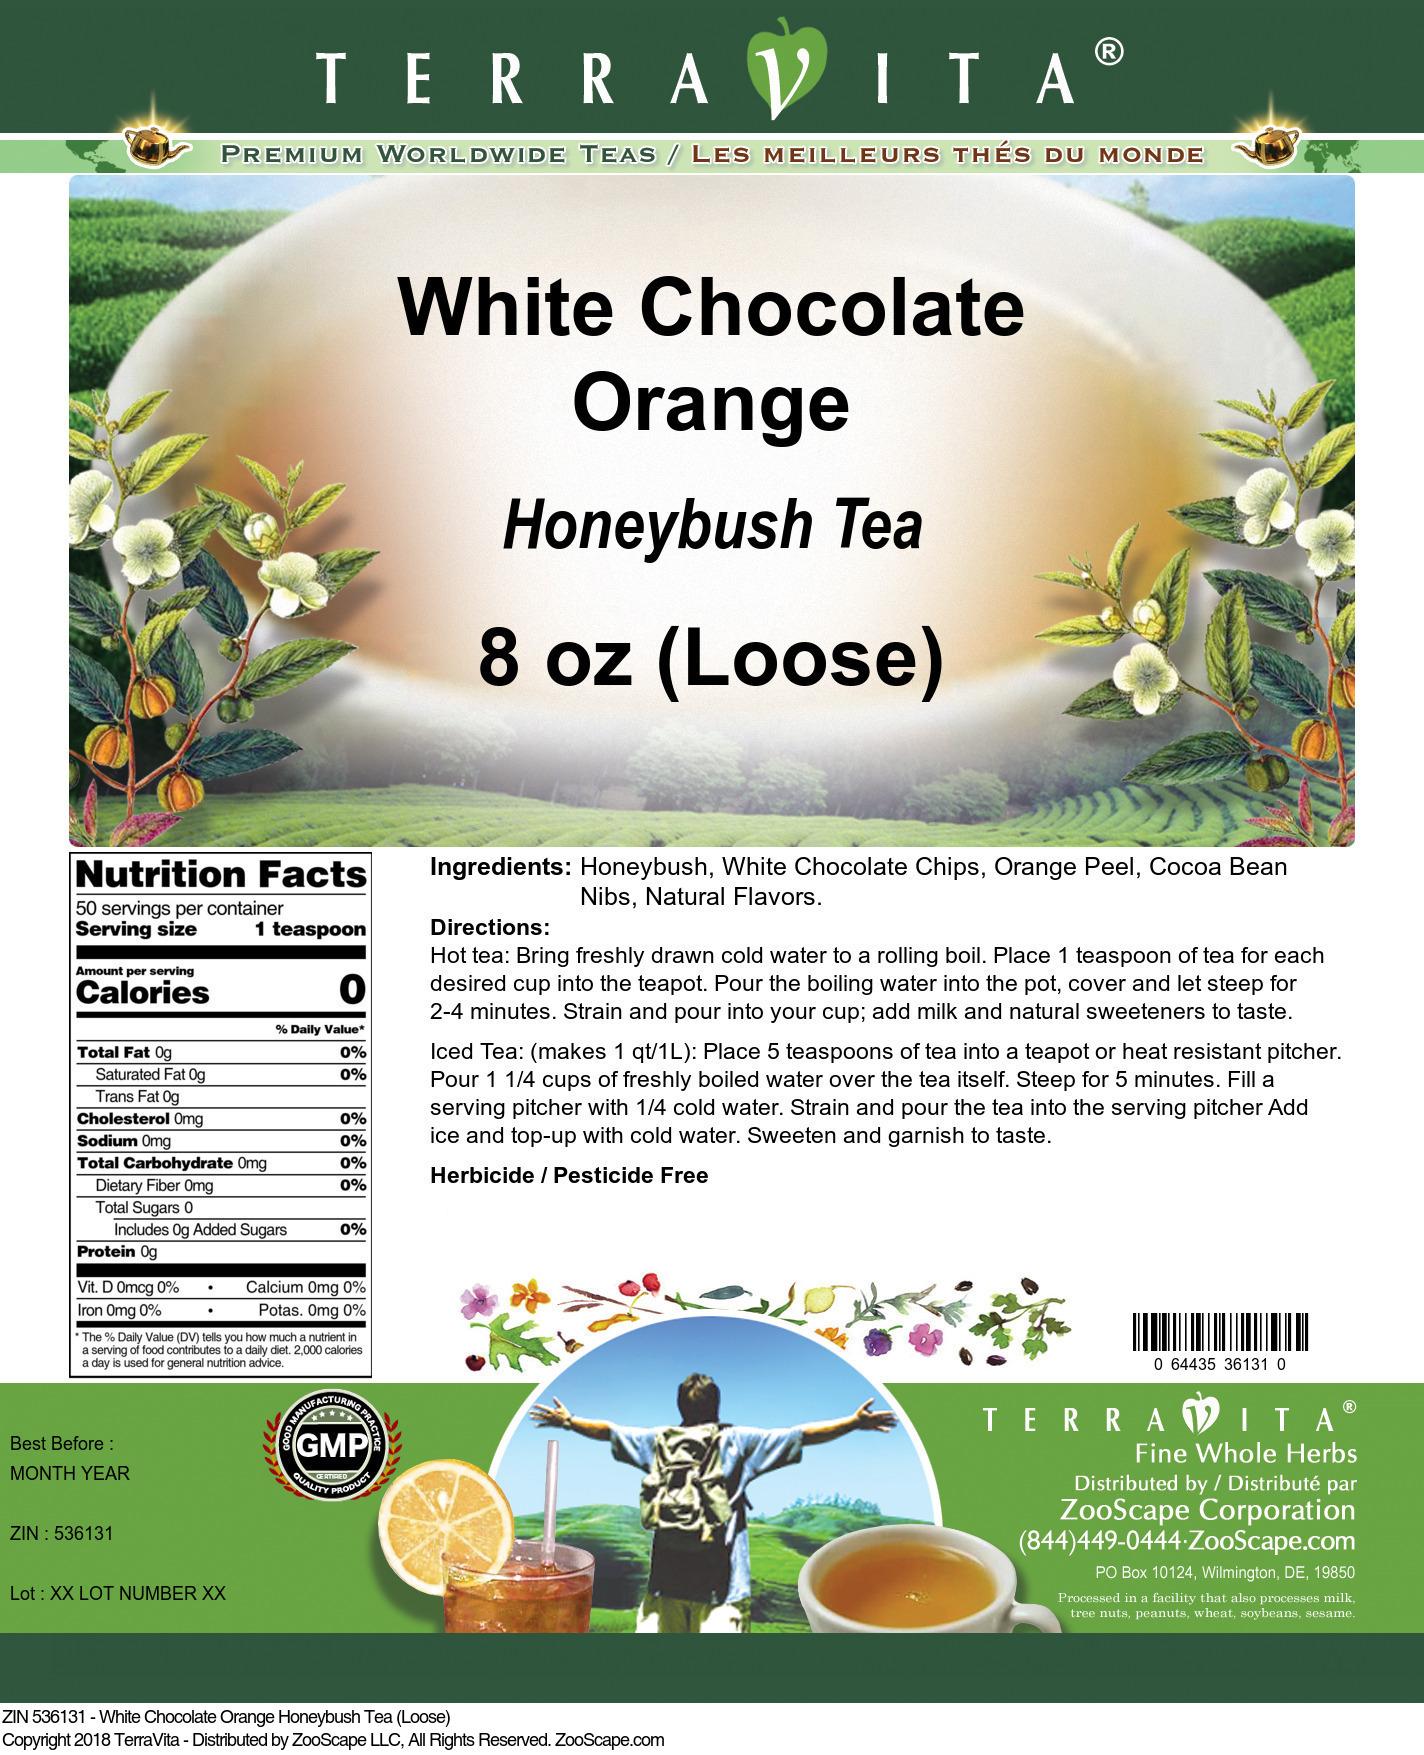 White Chocolate Orange Honeybush Tea (Loose)